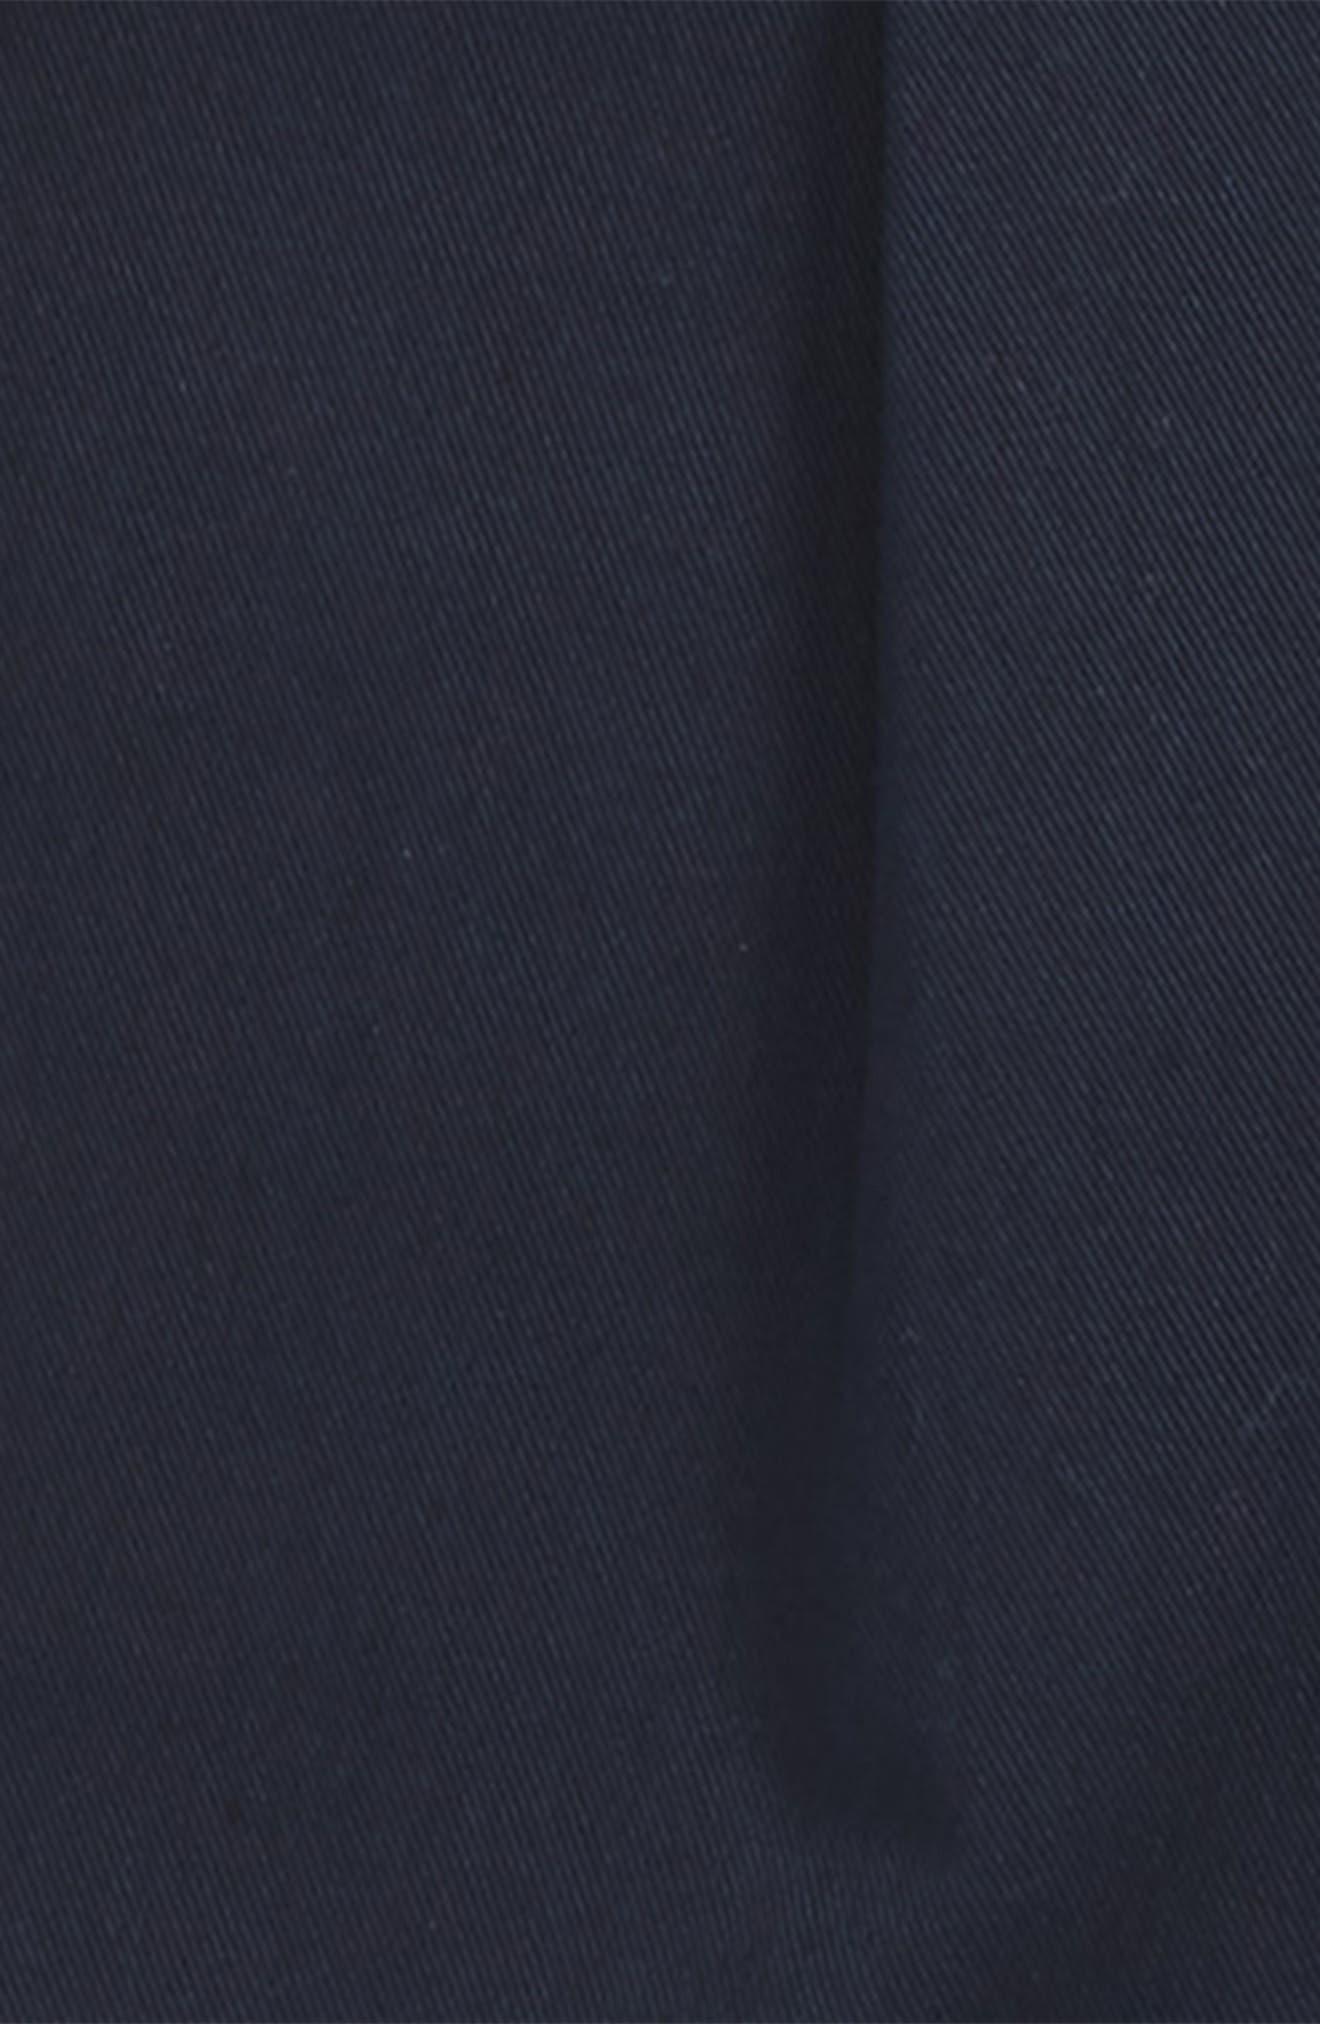 Alternate Image 2  - Gucci Chino Pants (Little Boys & Big Boys)